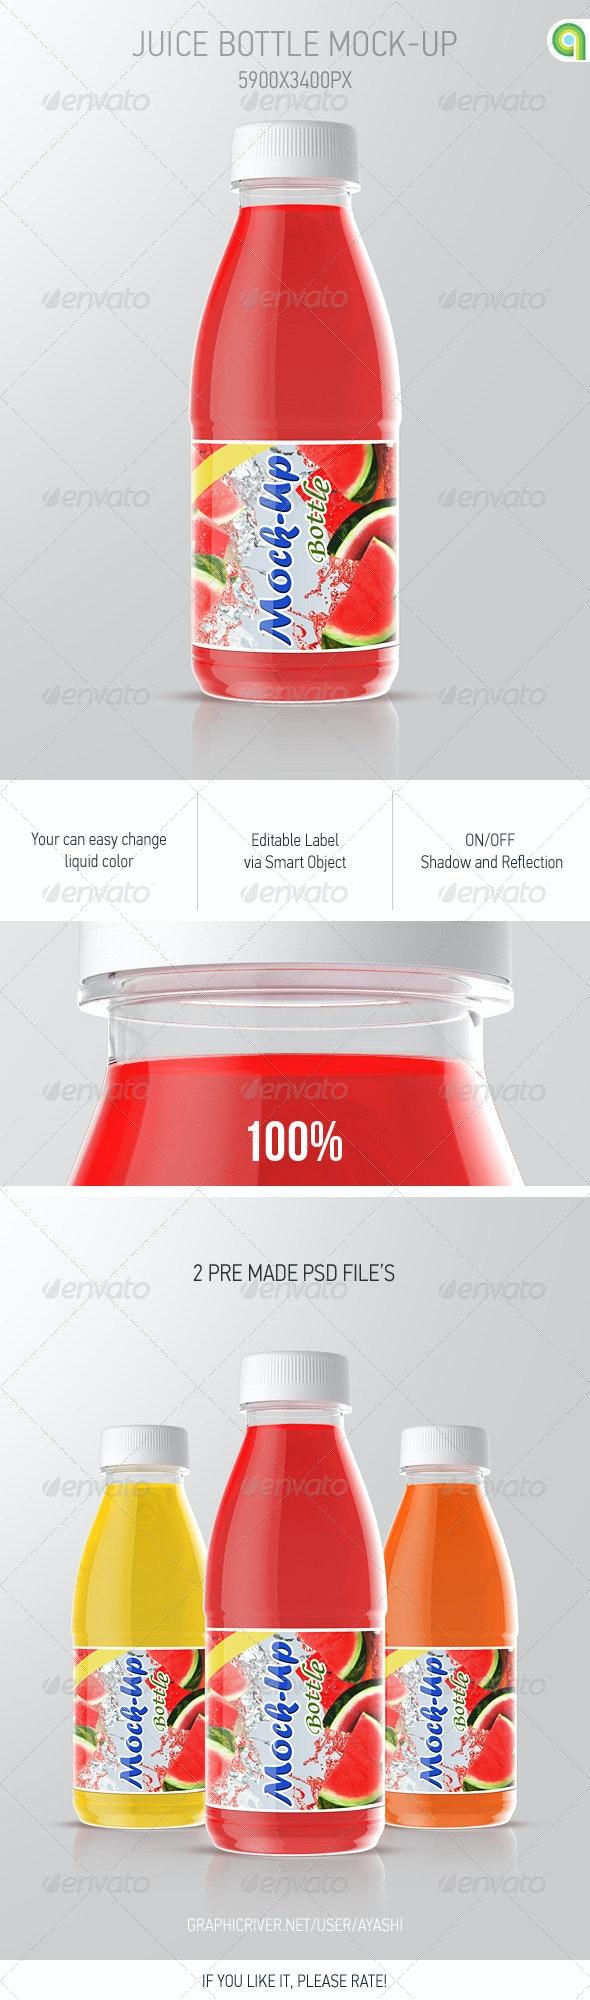 Juice Bottle Mockup - Food and Drink Packaging